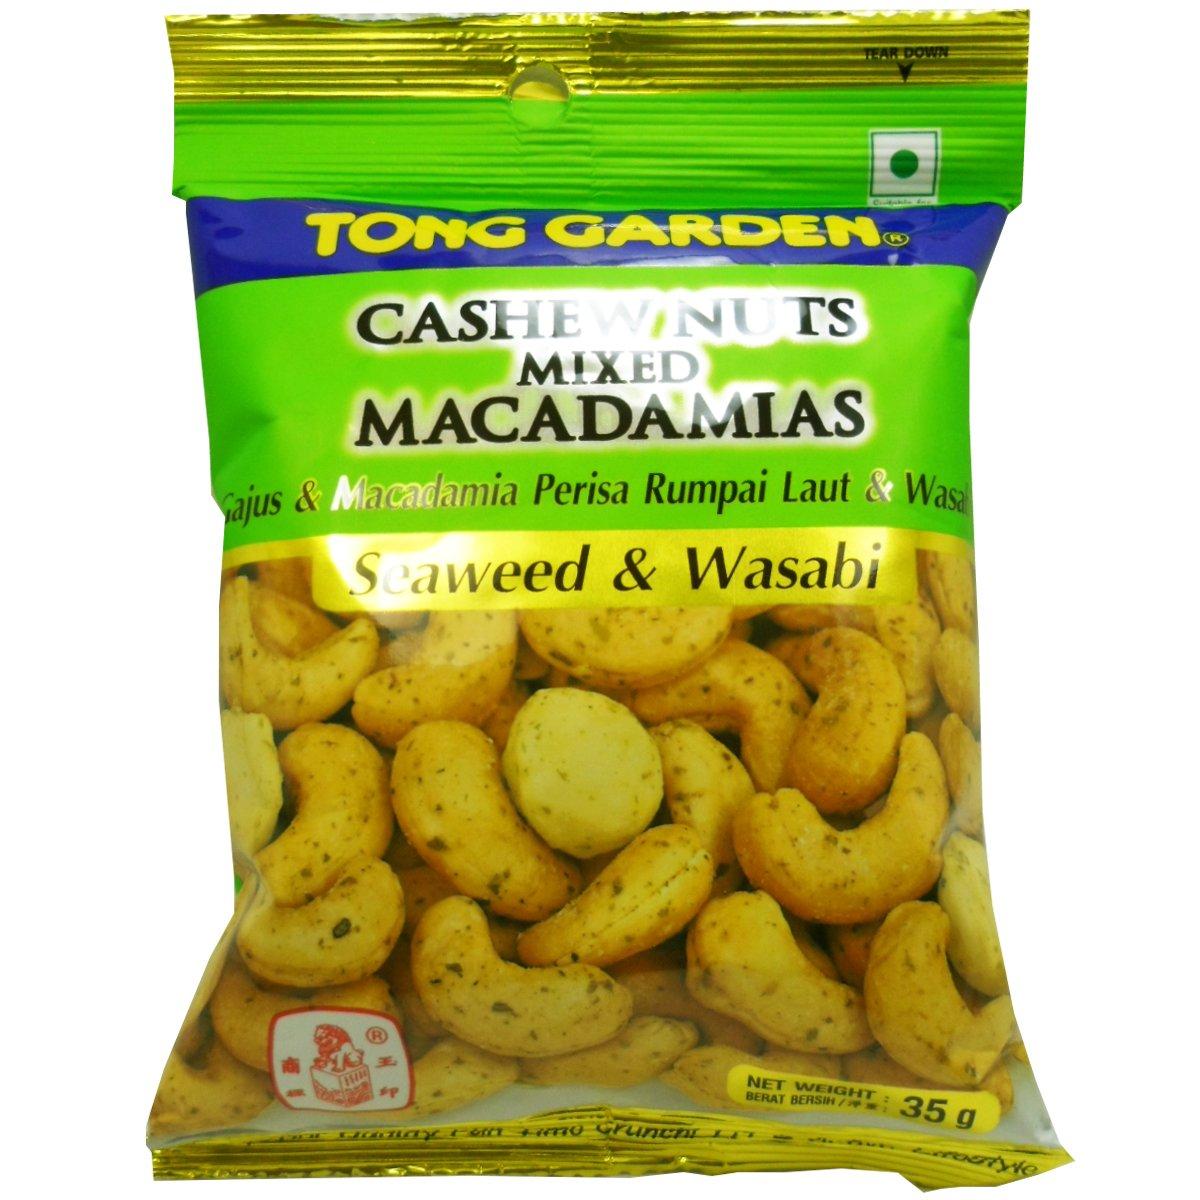 Crispy Cashew Nuts Mixed Macadamias Snack Seaweed & Wasabi Flavoured Net Wt 35 G (1.23 Oz.) Tong Garden Brand X 2 Bags